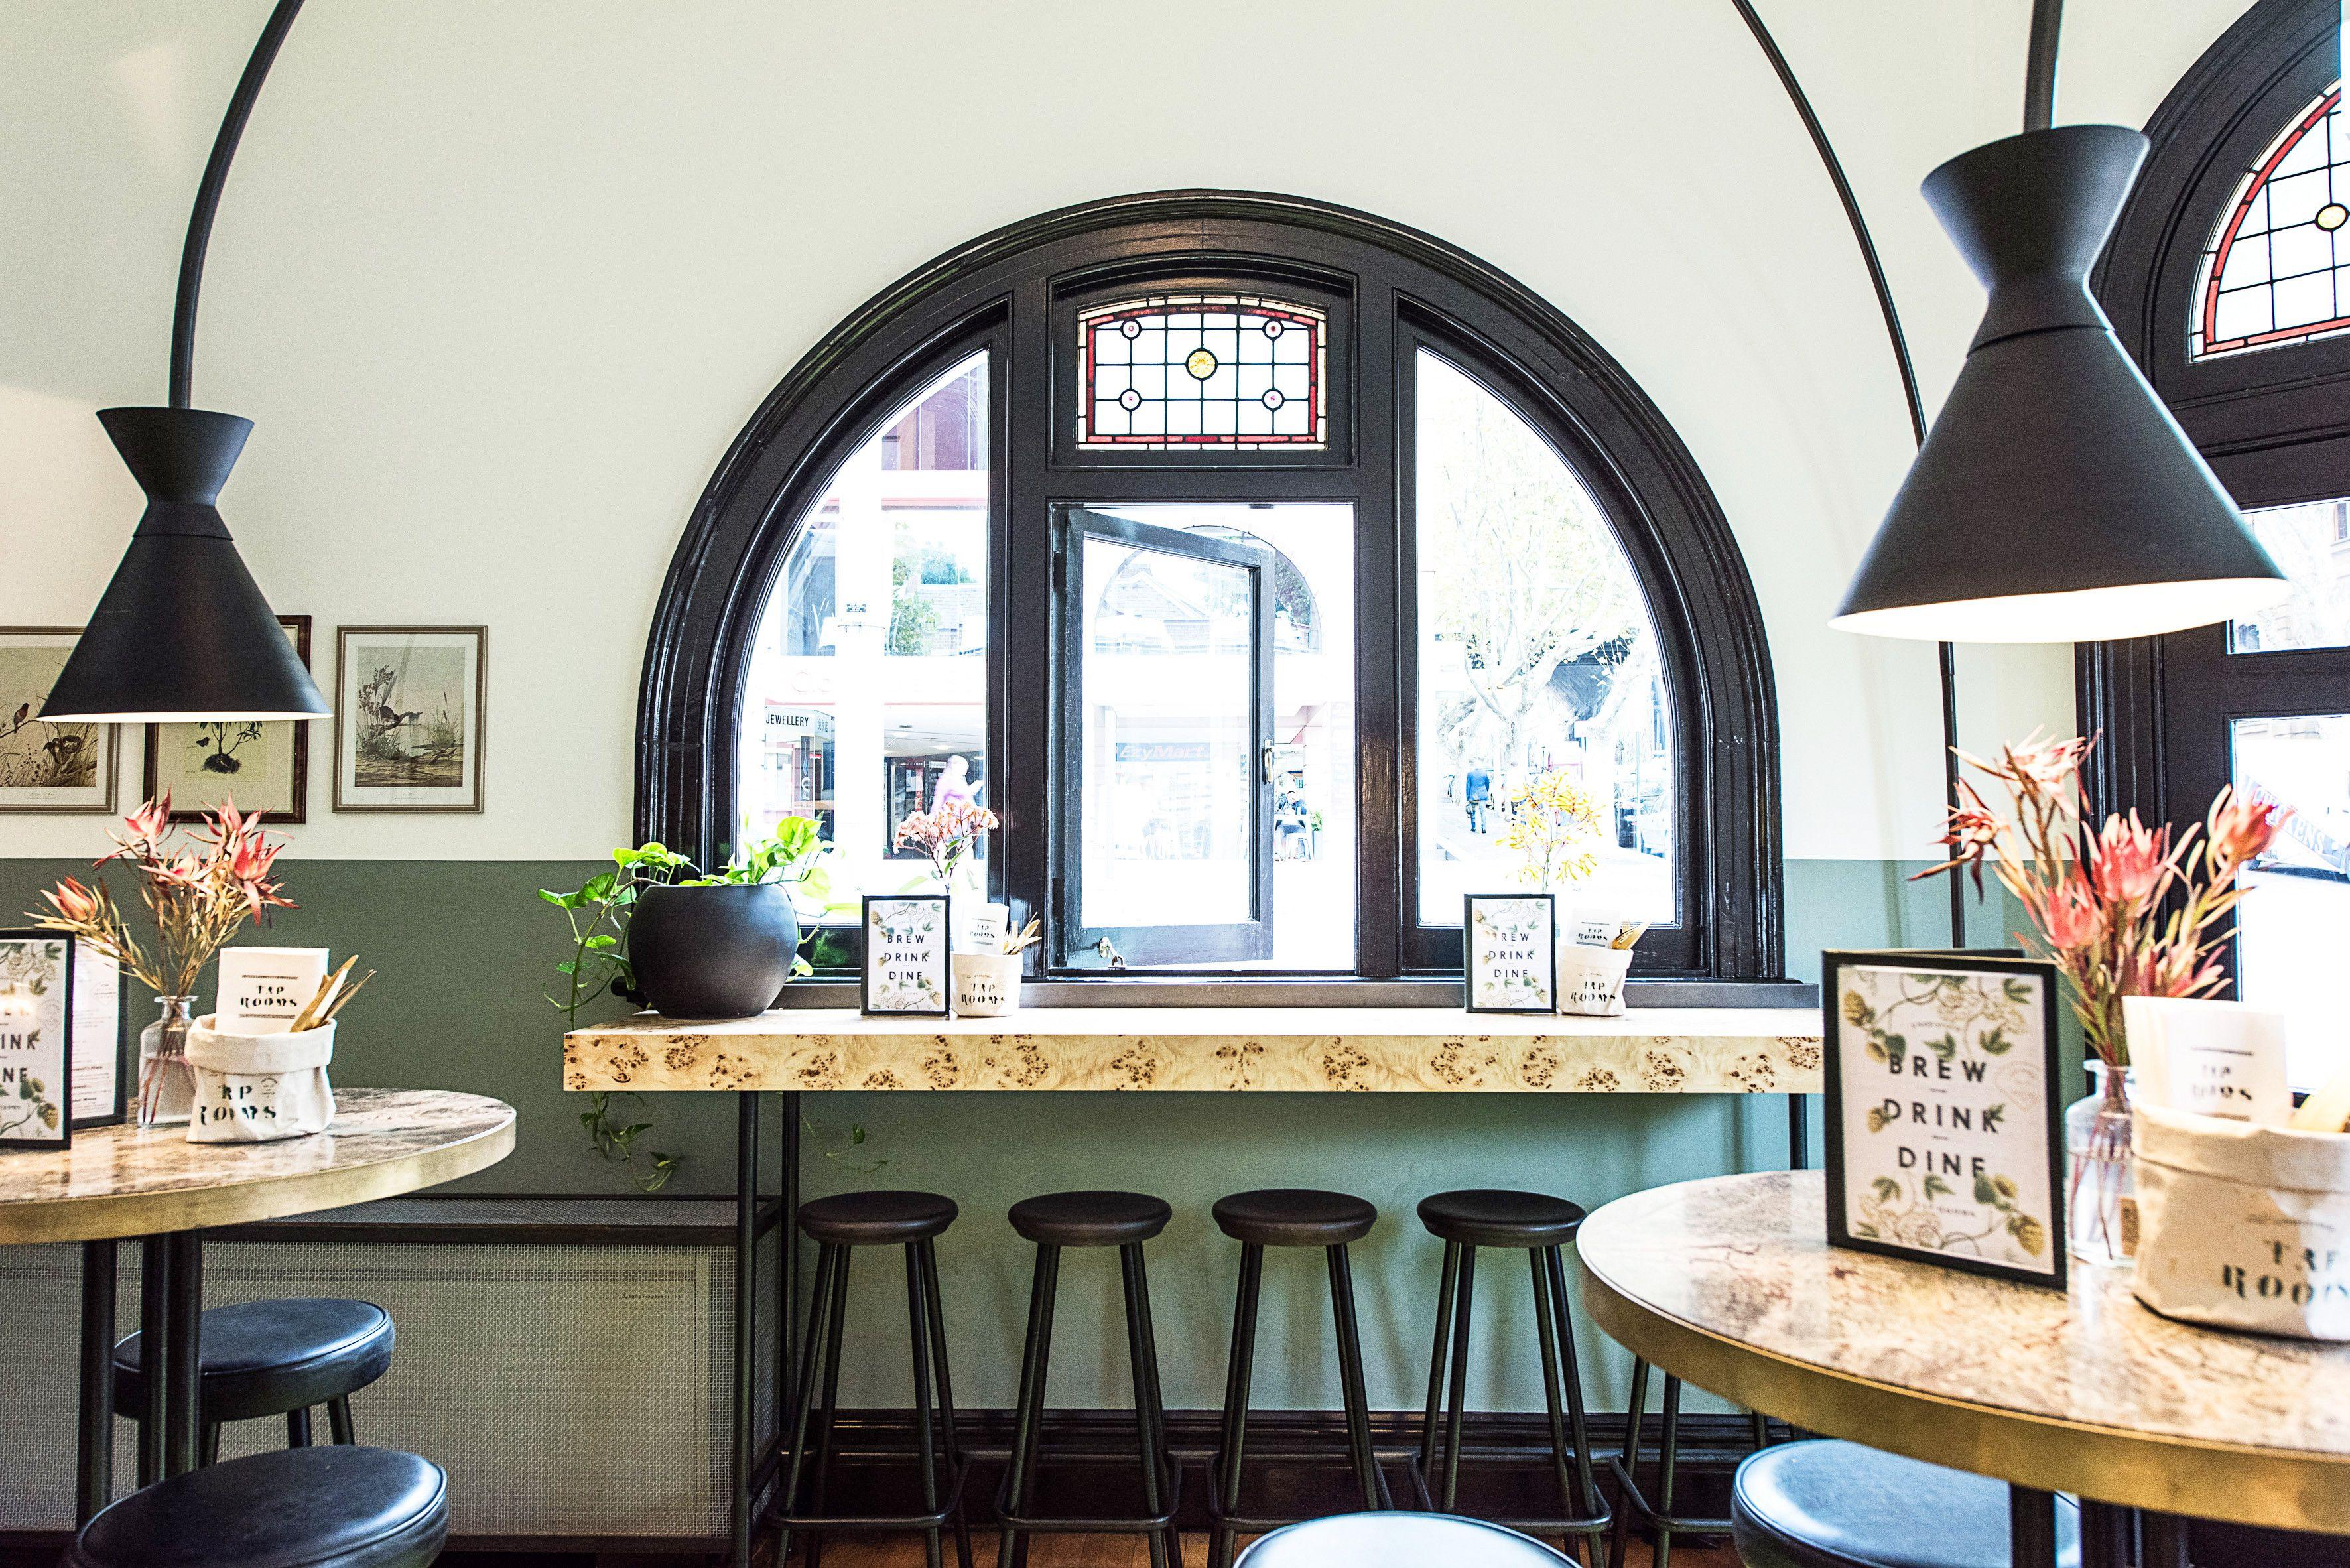 Tour a Charming New Bar in The Rocks via @MyDomaineAU